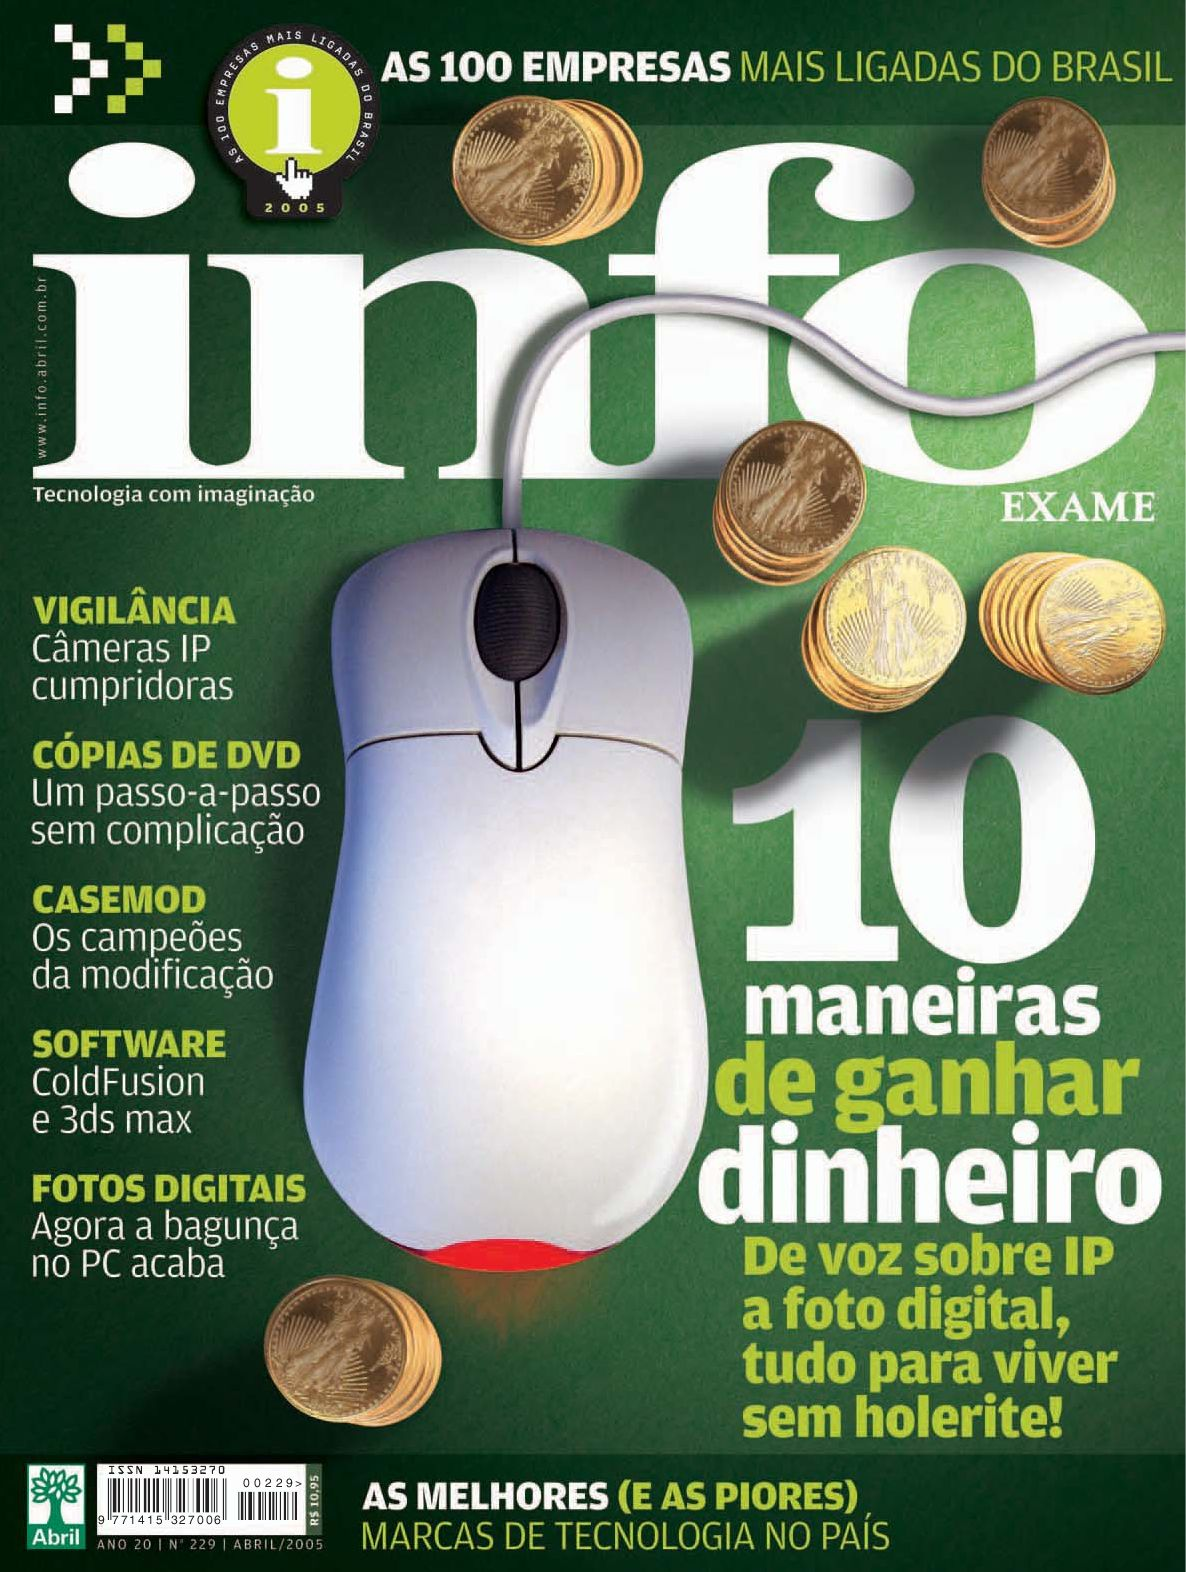 977c977a47 INFO - Abr 2005 by Revista INFO - issuu